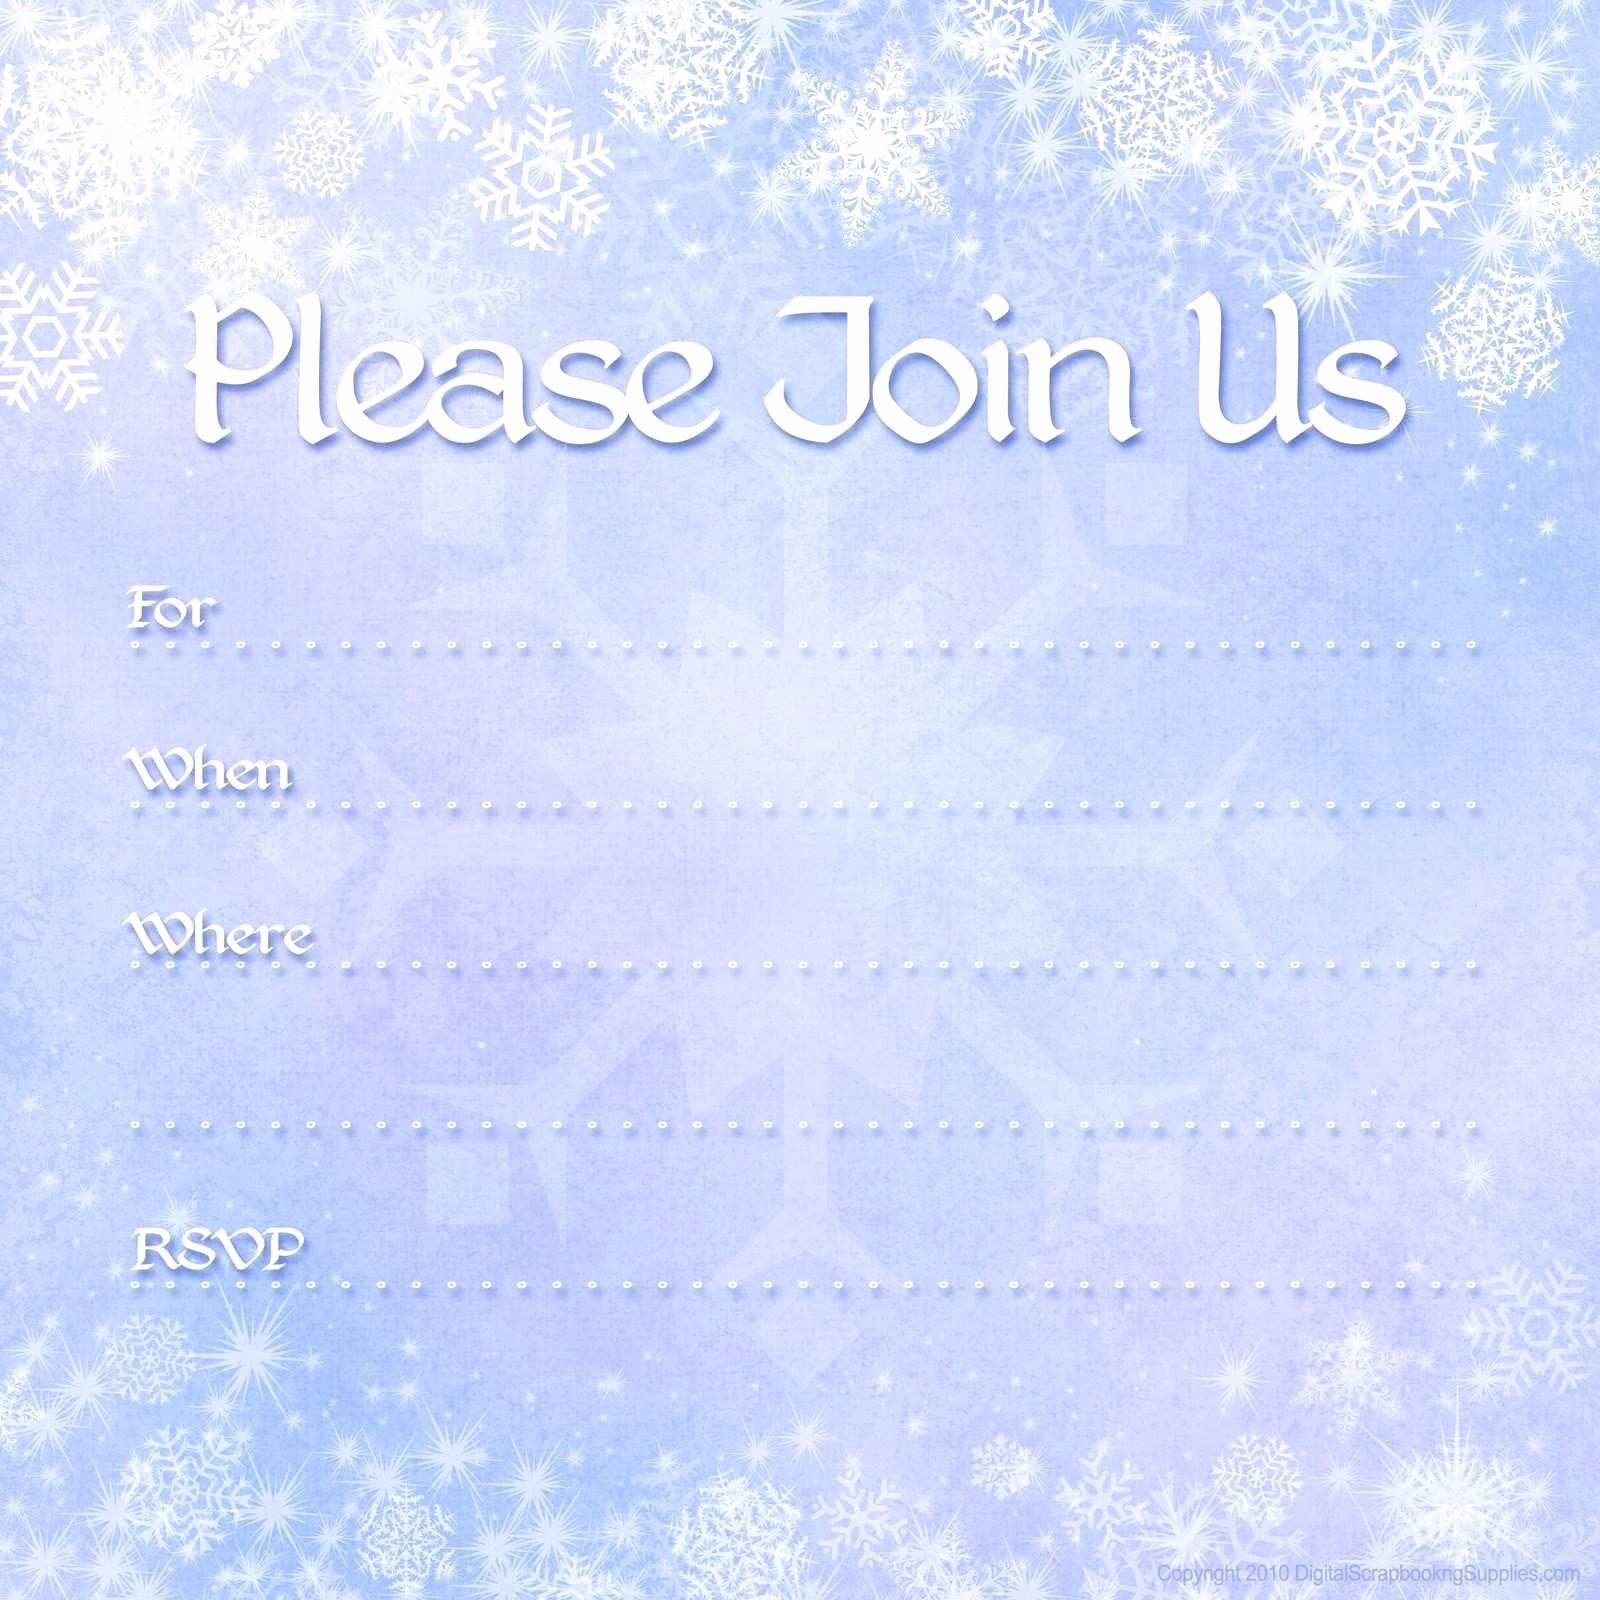 Winter Wonderland Invitation Template Free Elegant Winter Wonderland Invitation Template Free 2018 25 Elegant